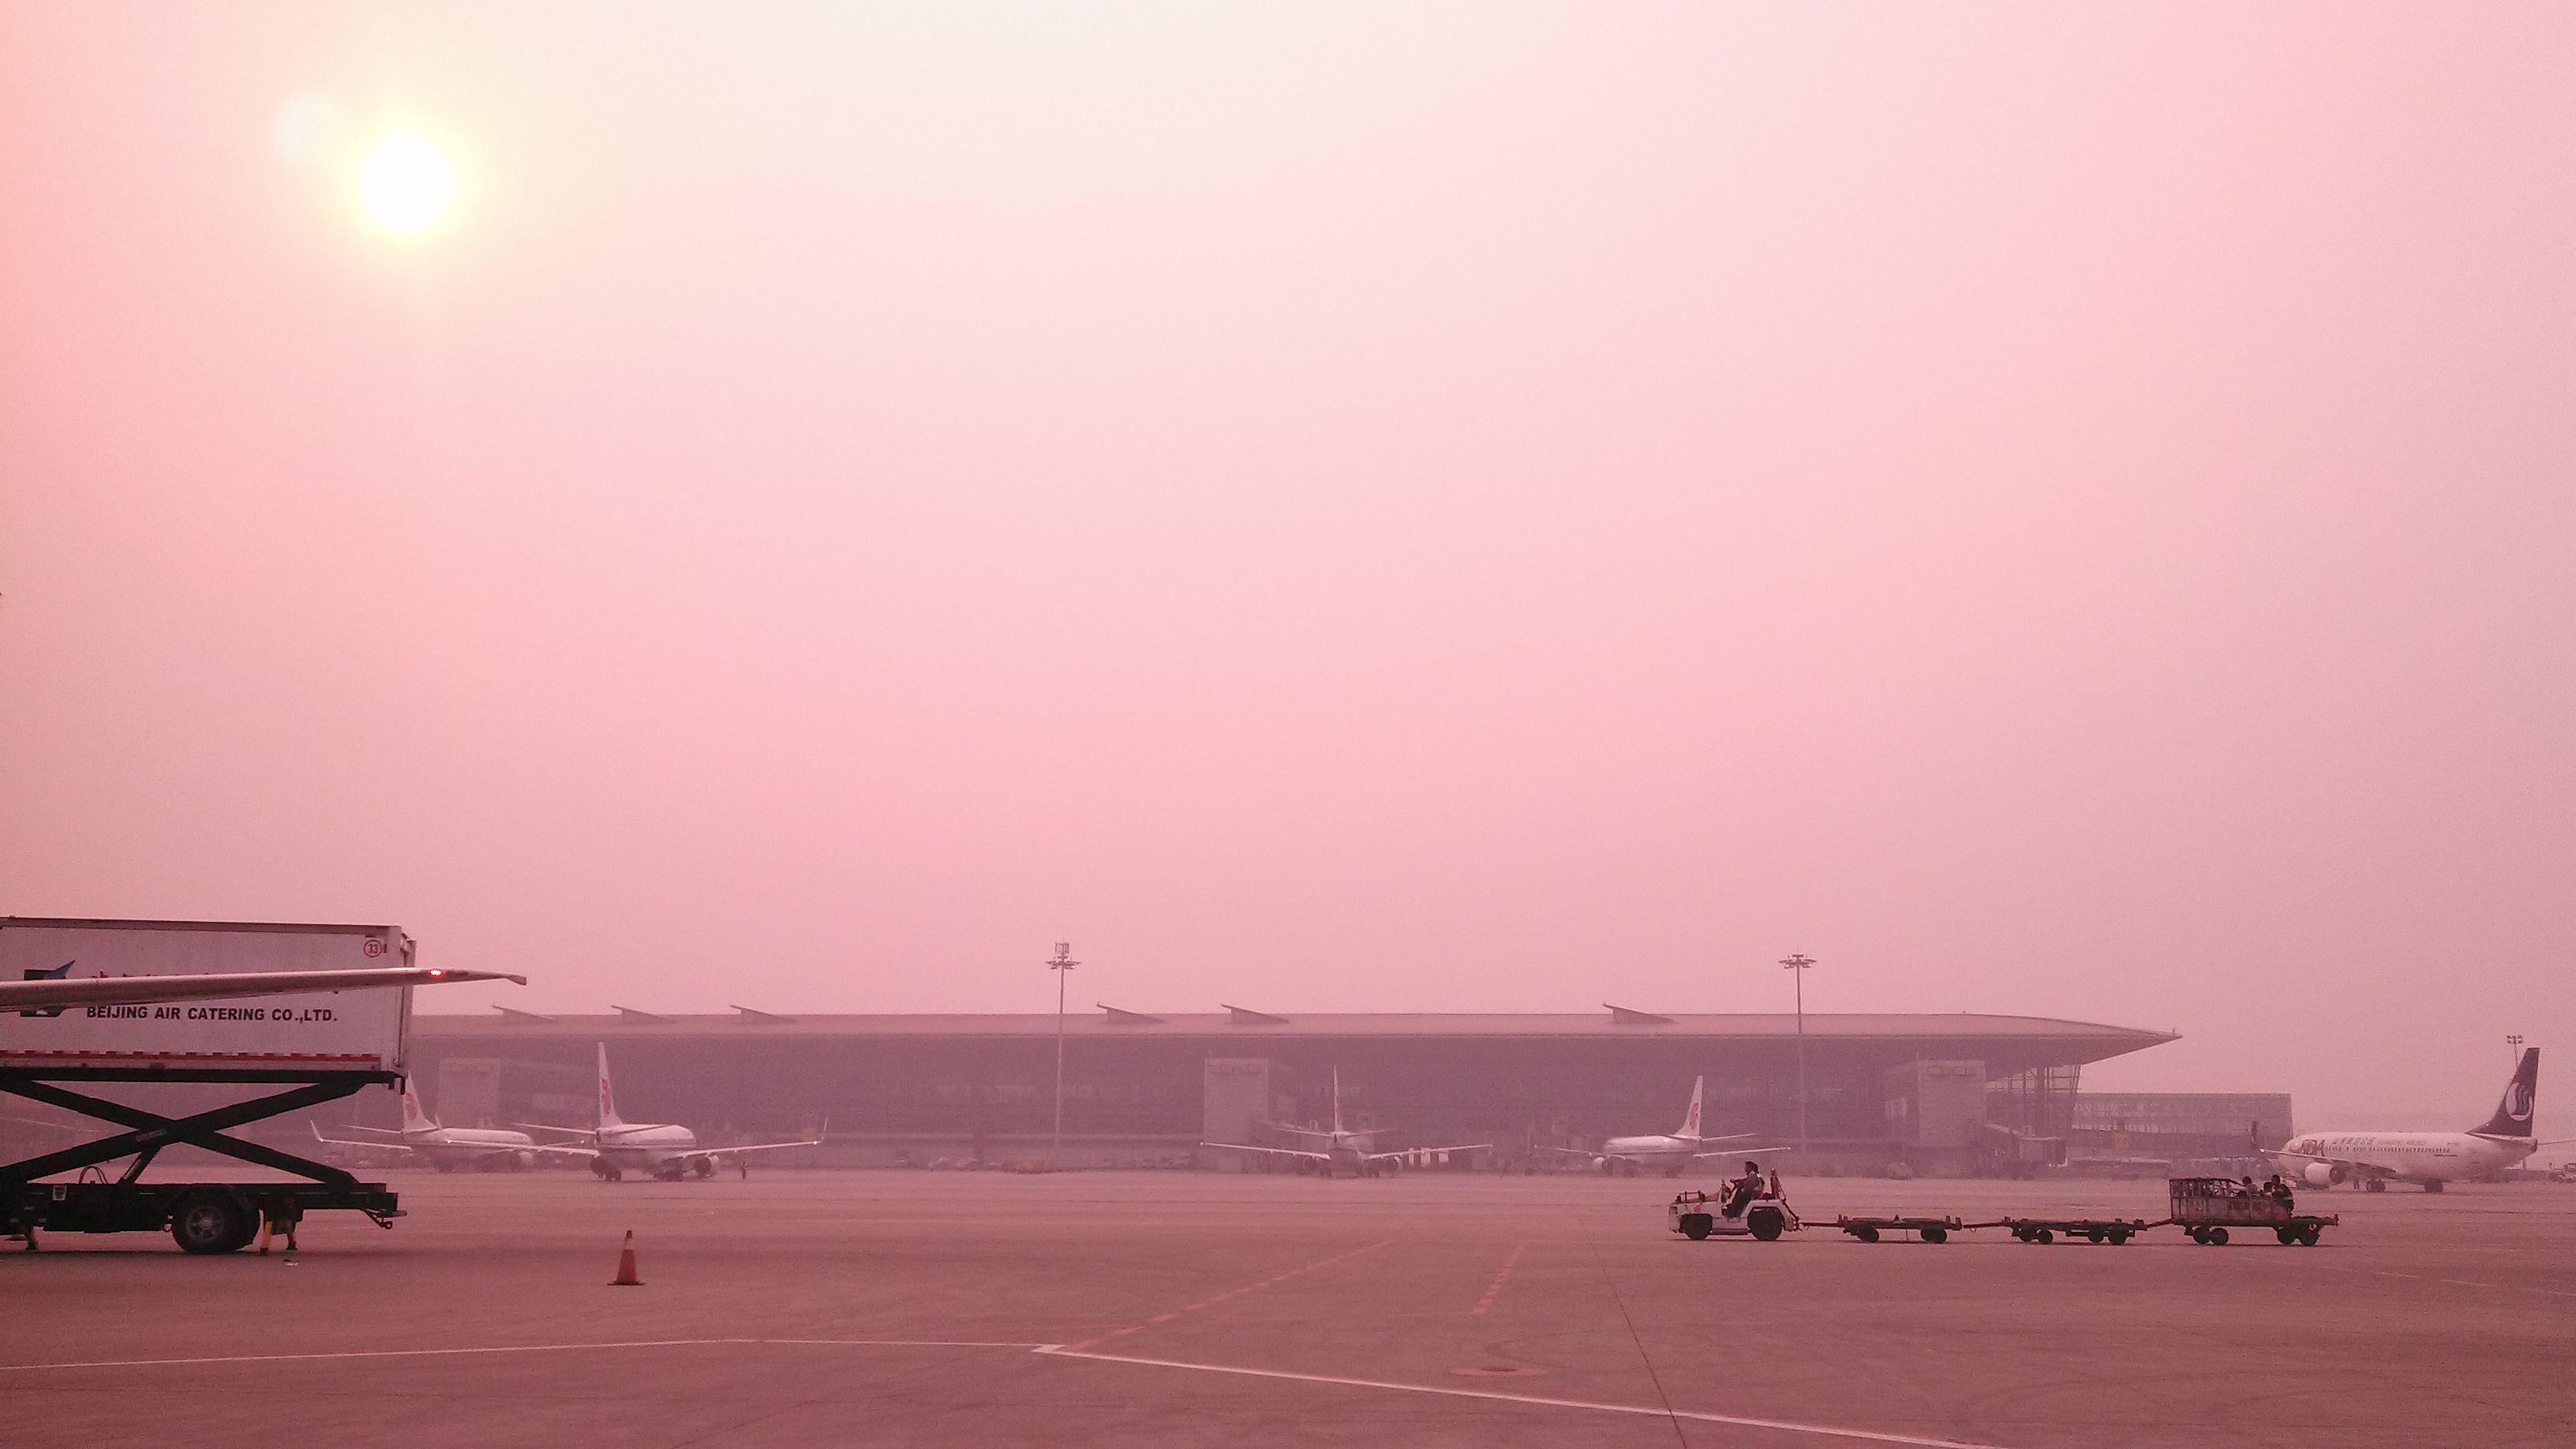 Les pistes de l'aéroport de Pekin